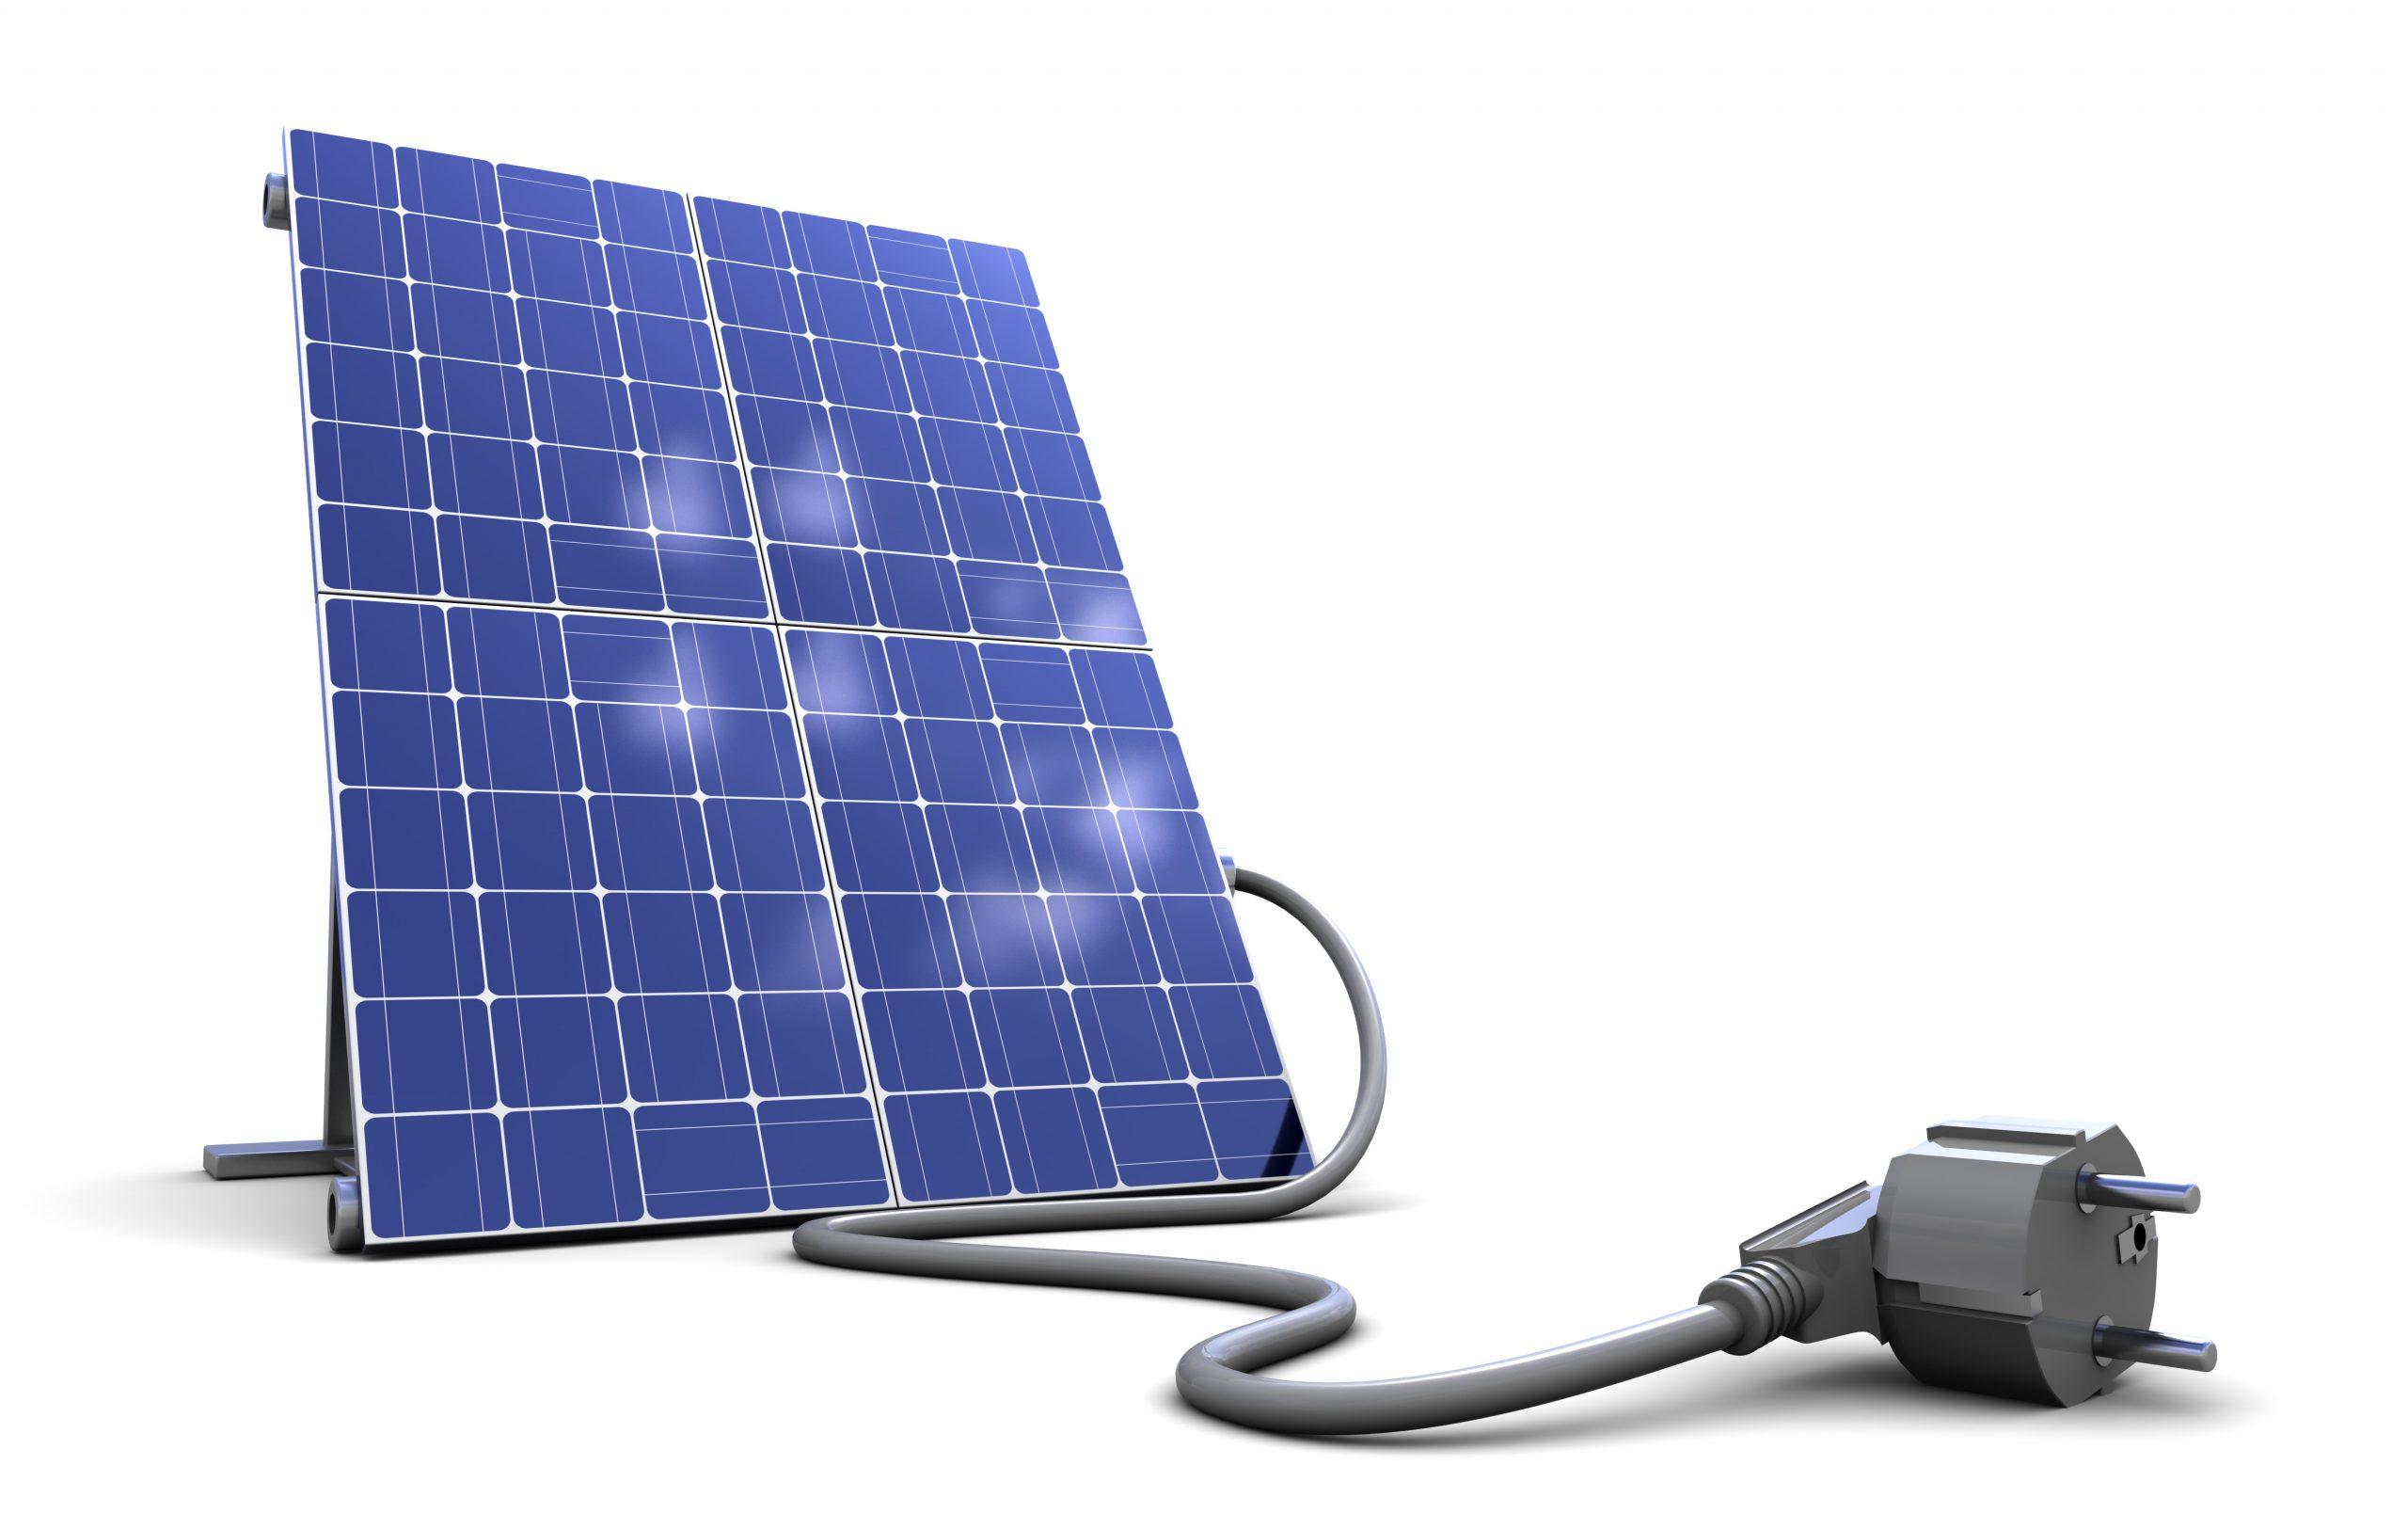 Stecker Solaranlage Balkonsolar